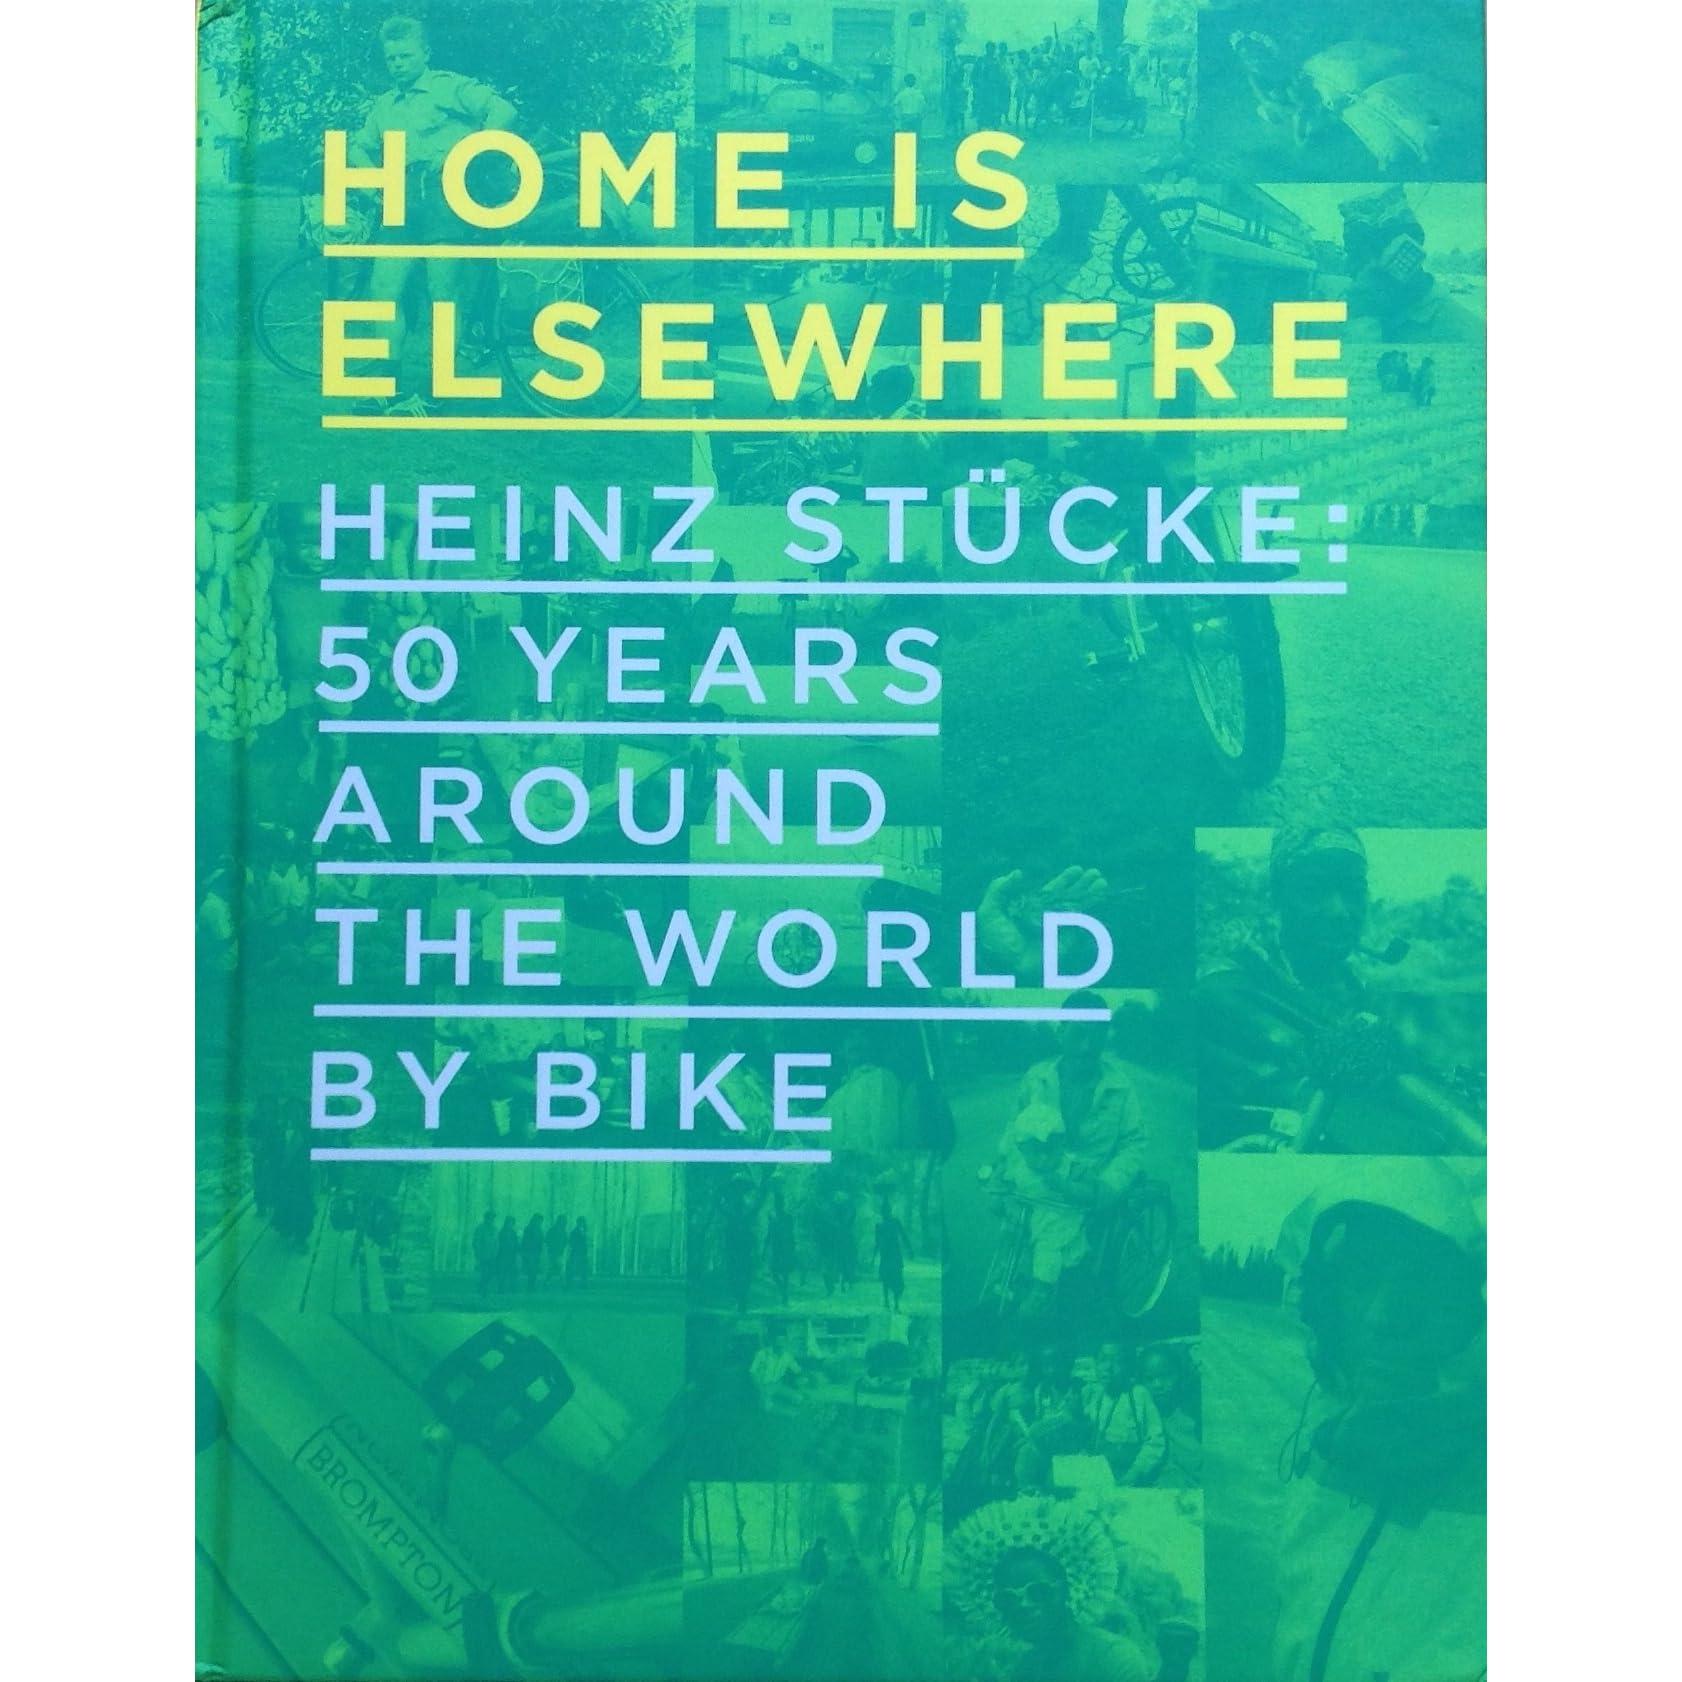 Home is elsewhere by Eric van den Berg b44d91d4f